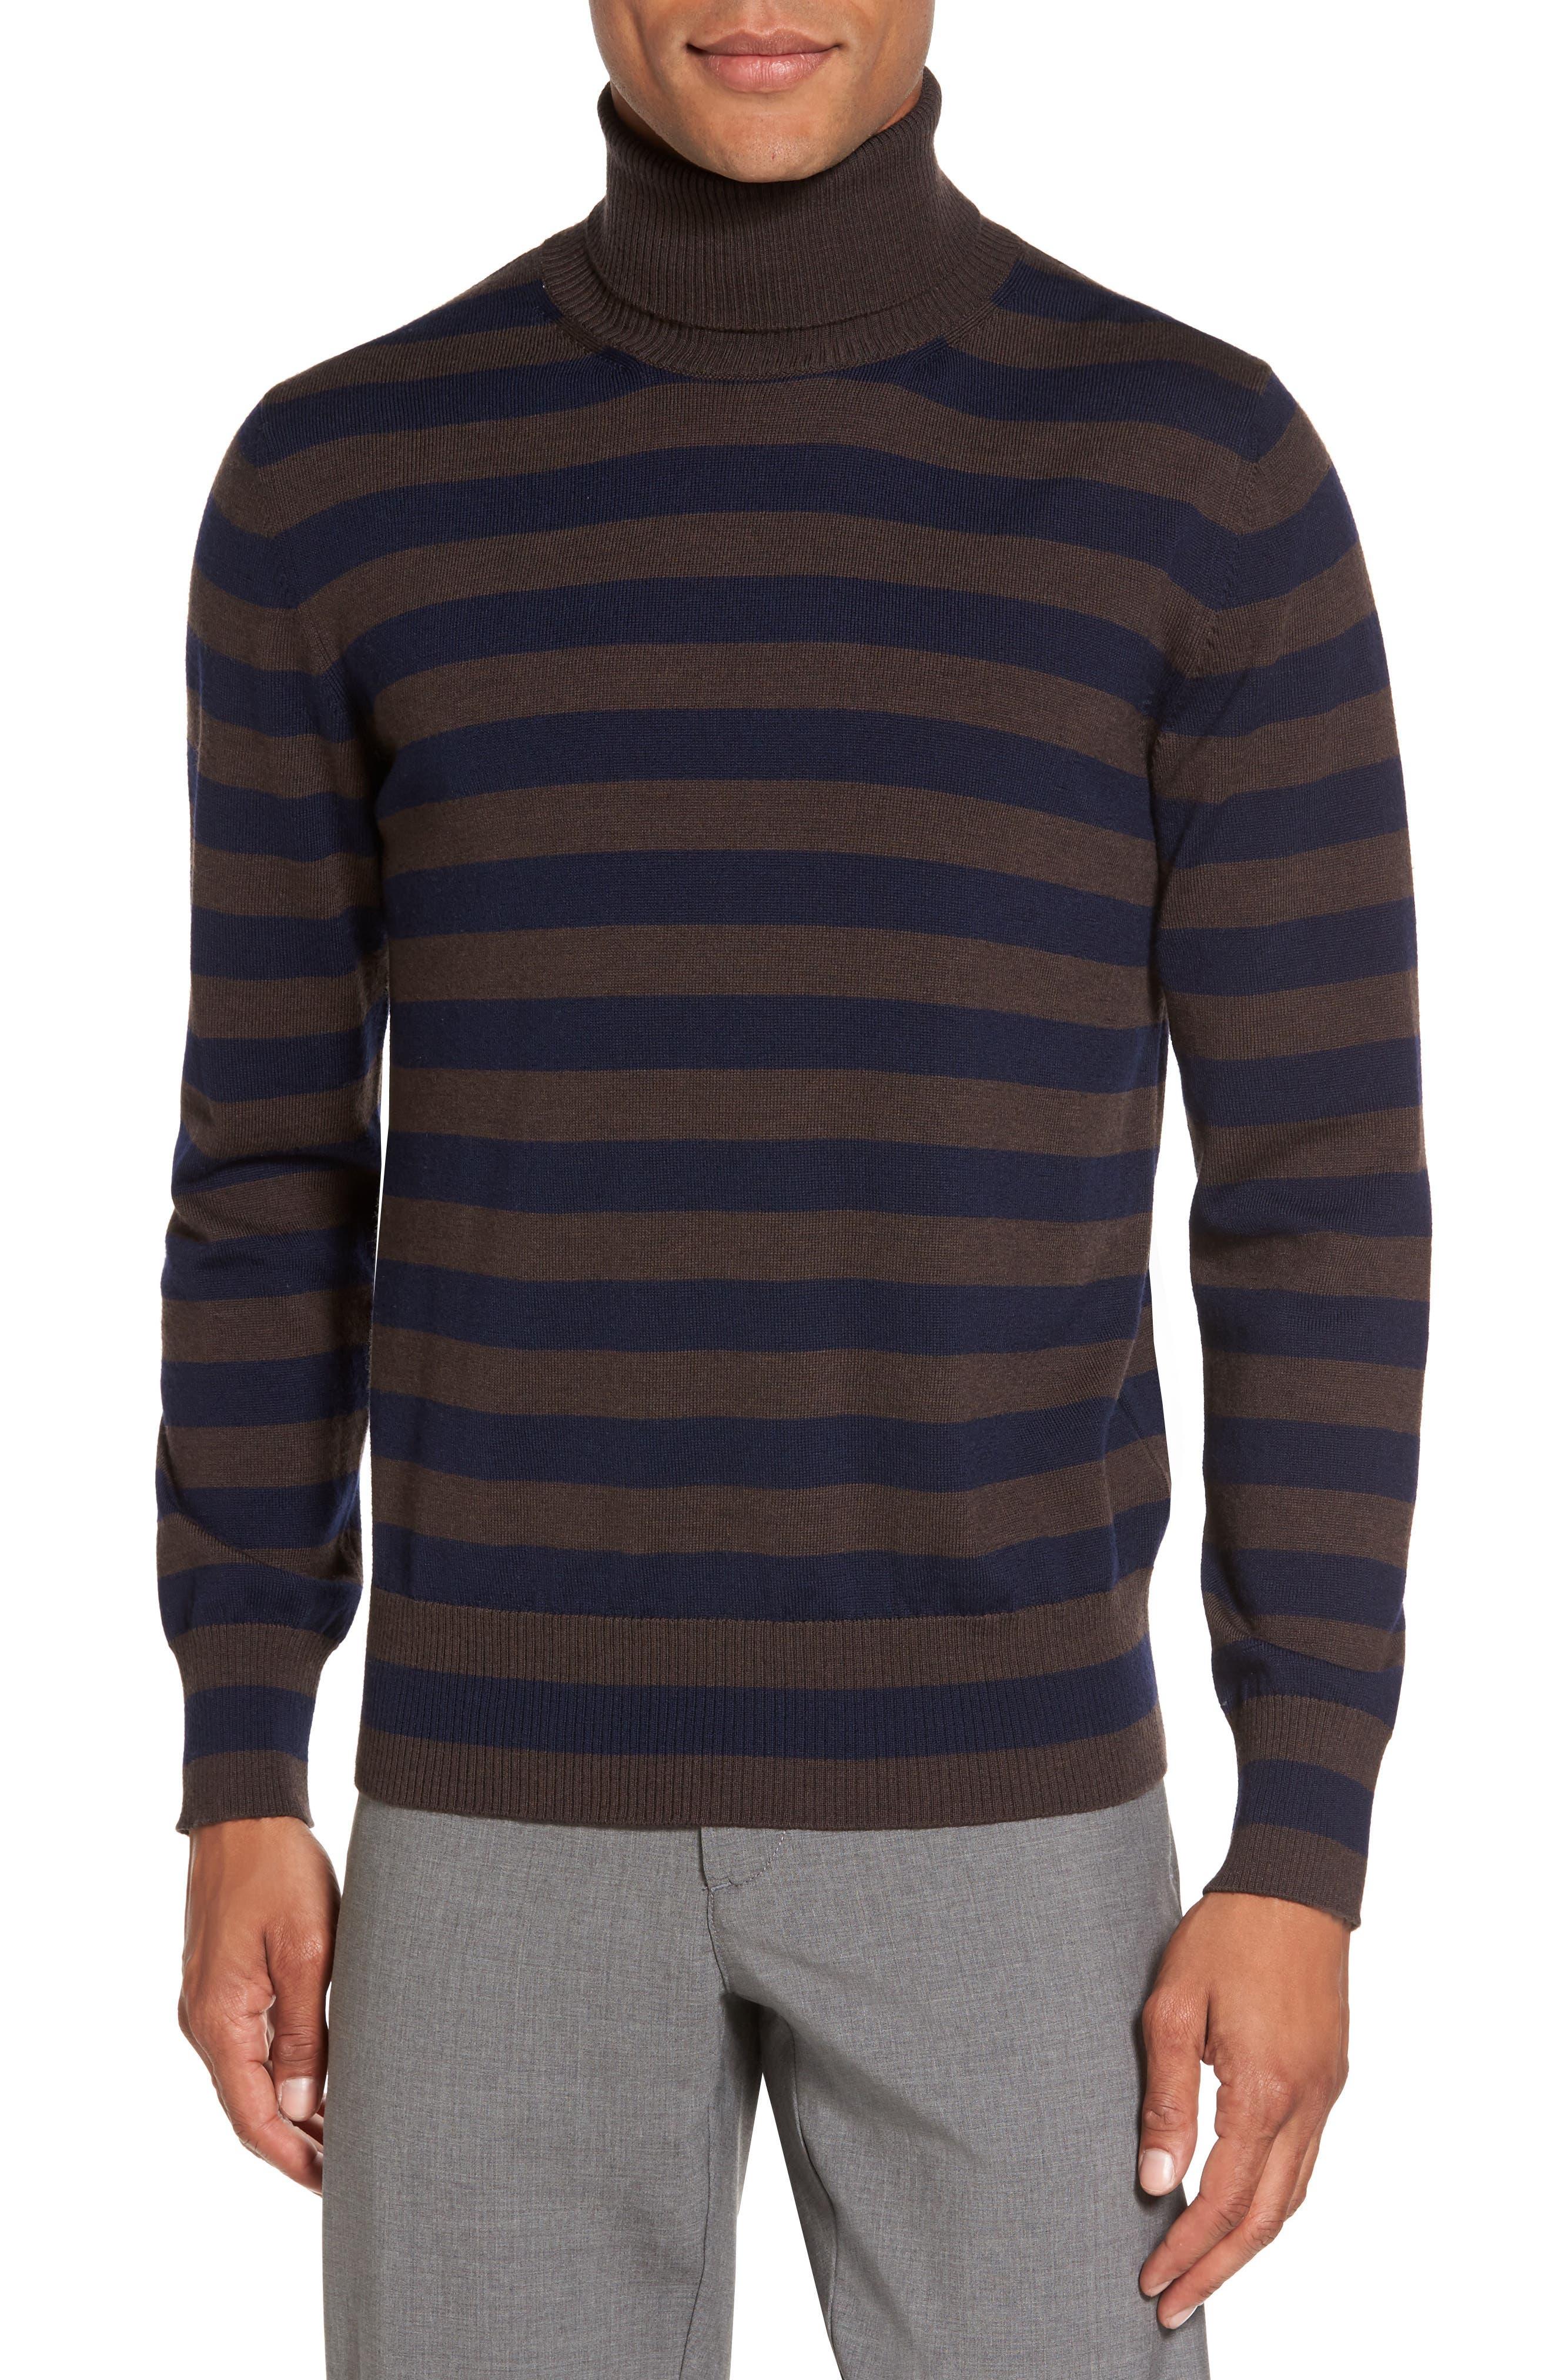 Alternate Image 1 Selected - Eleventy Striped Turtleneck Sweater